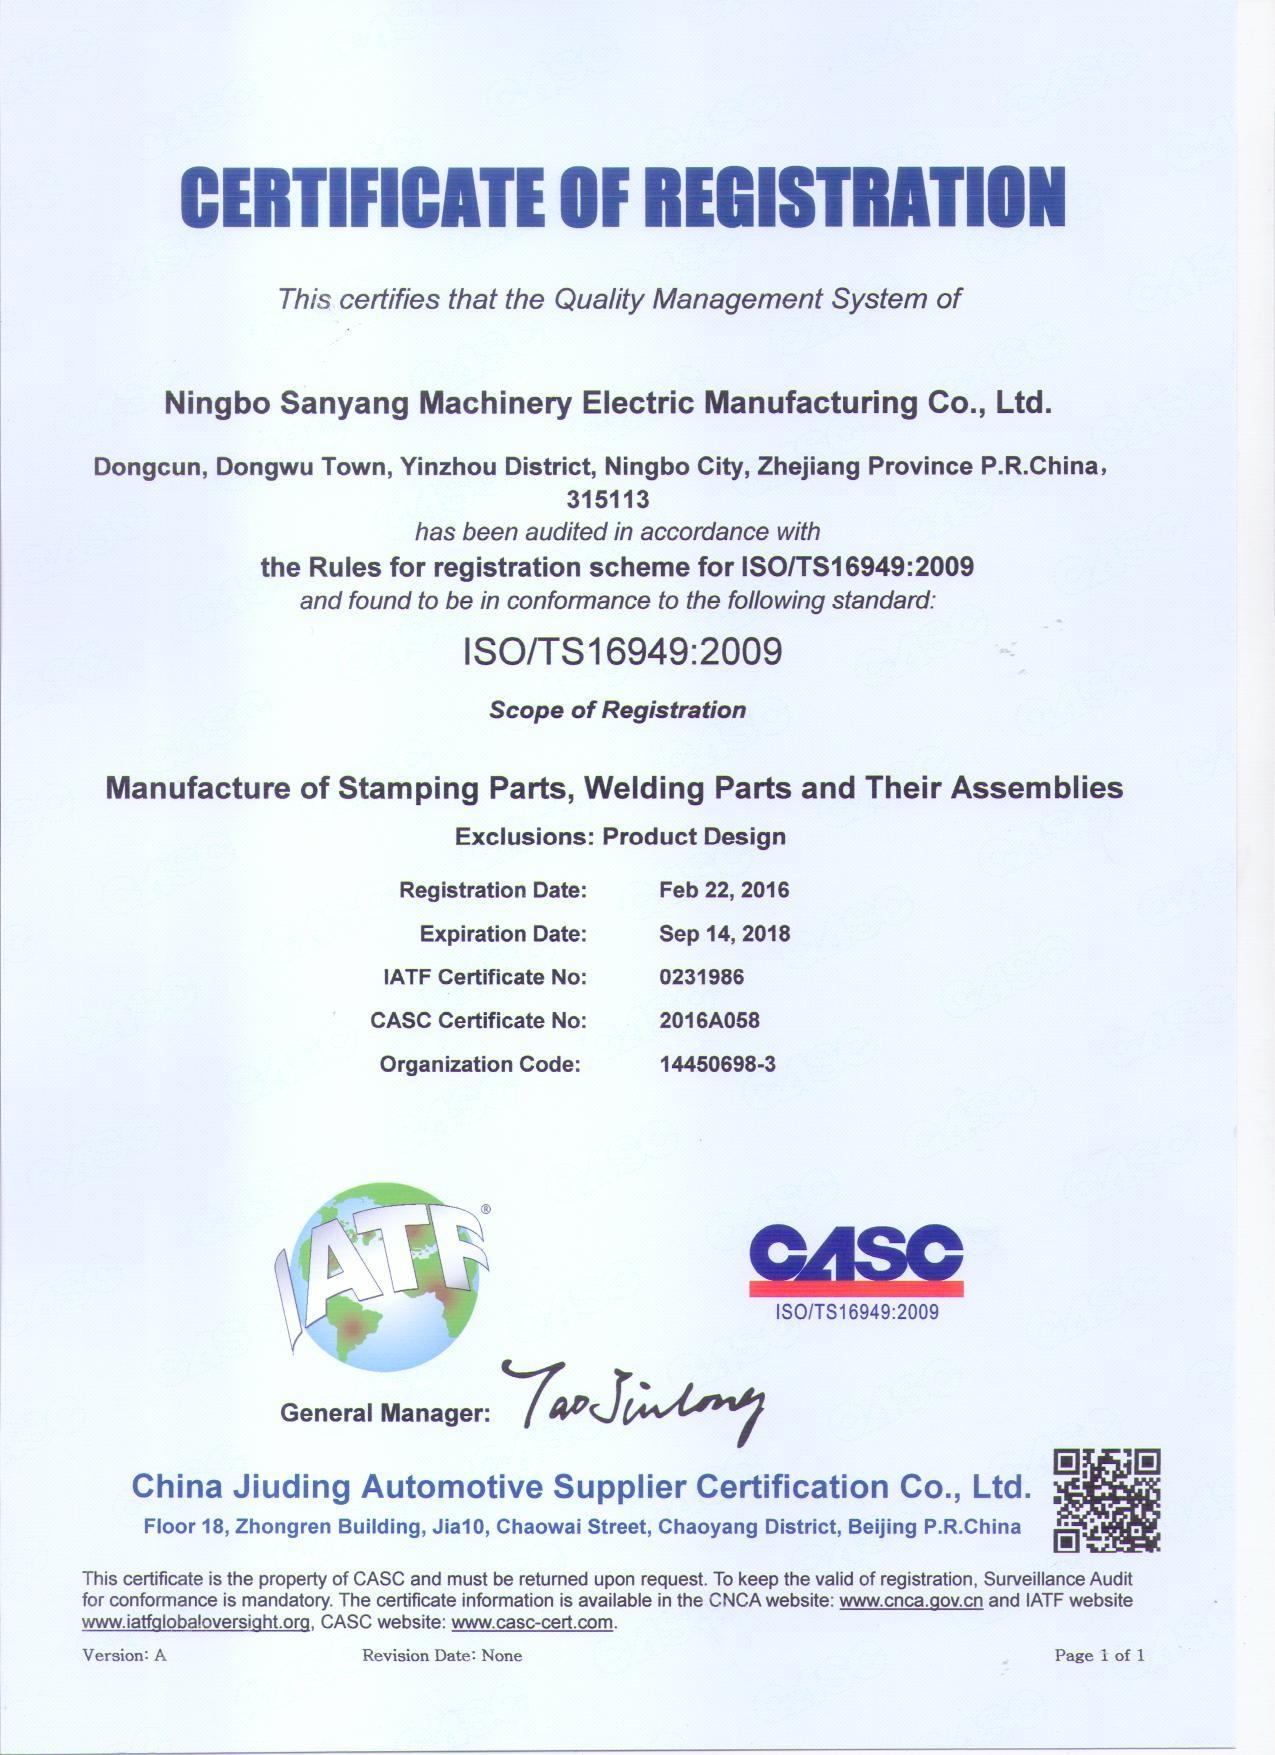 TS16949 Certification